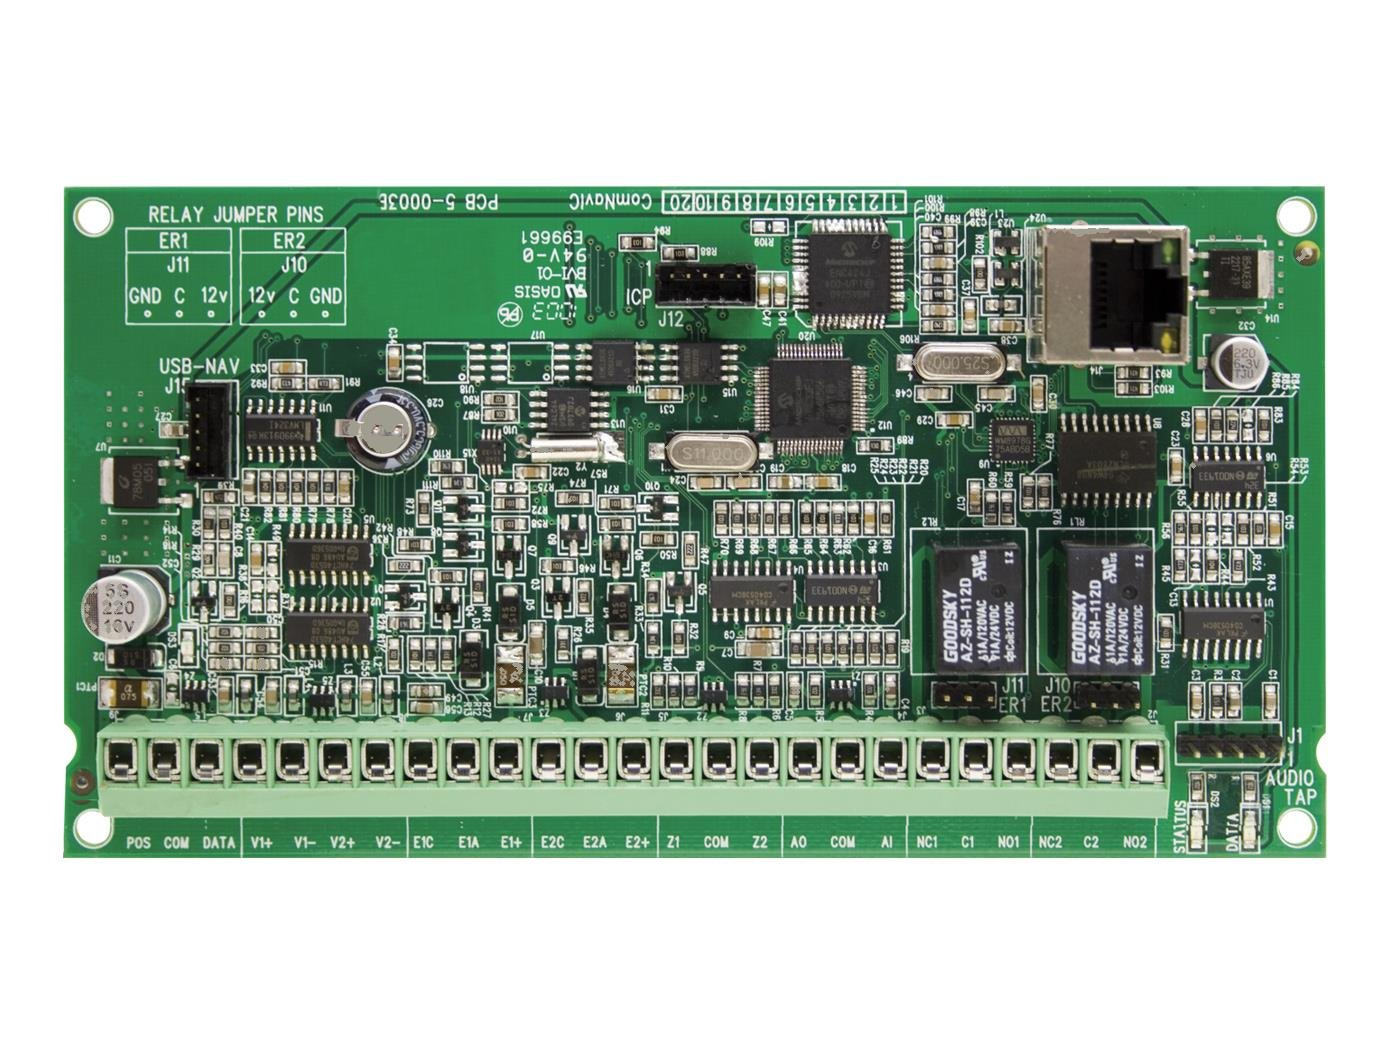 Amazon.com : UTC (Formerly GE Security/Caddx) NX-595E NetworX IP  Communication Module : Camera & Photo